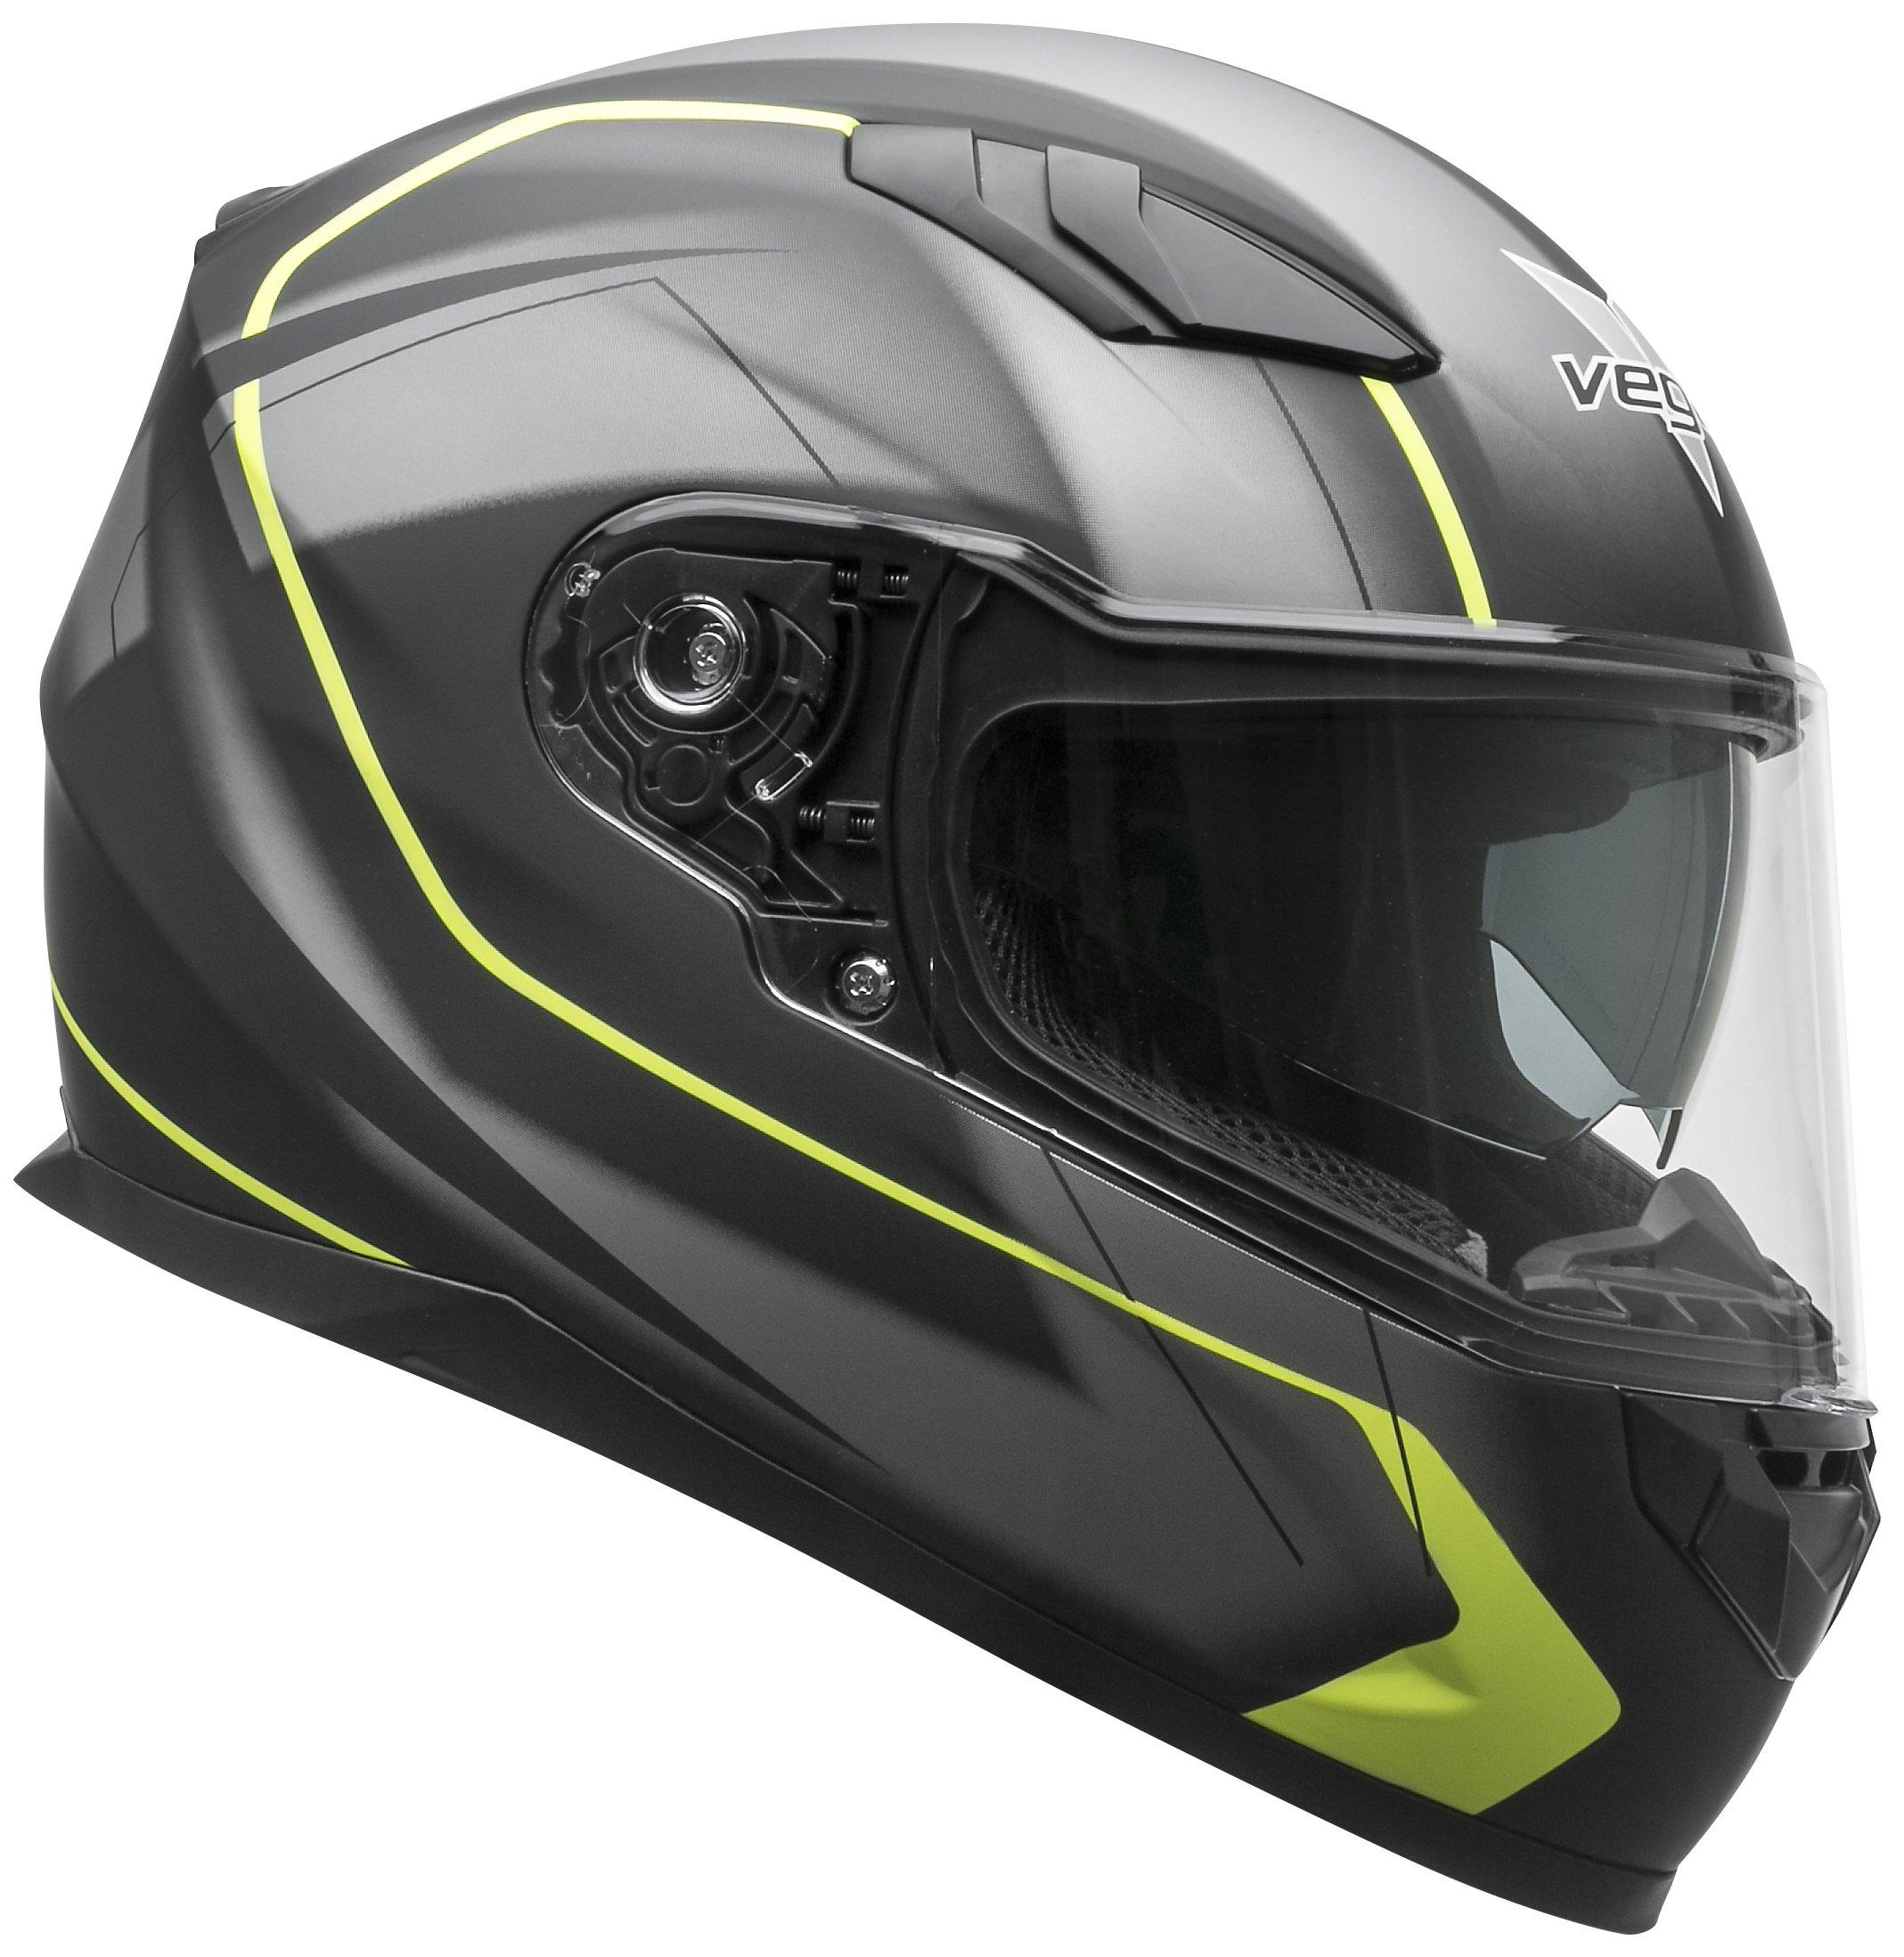 Vega Helmets RS1 Street Sunshield Motorcycle Helmet - DOT Certified Full Facerbike Helmet for Cruisers Sports Street Bike Scooter Touring Moped, Bluetooth Comp (Black Slinger Graphic, Small)